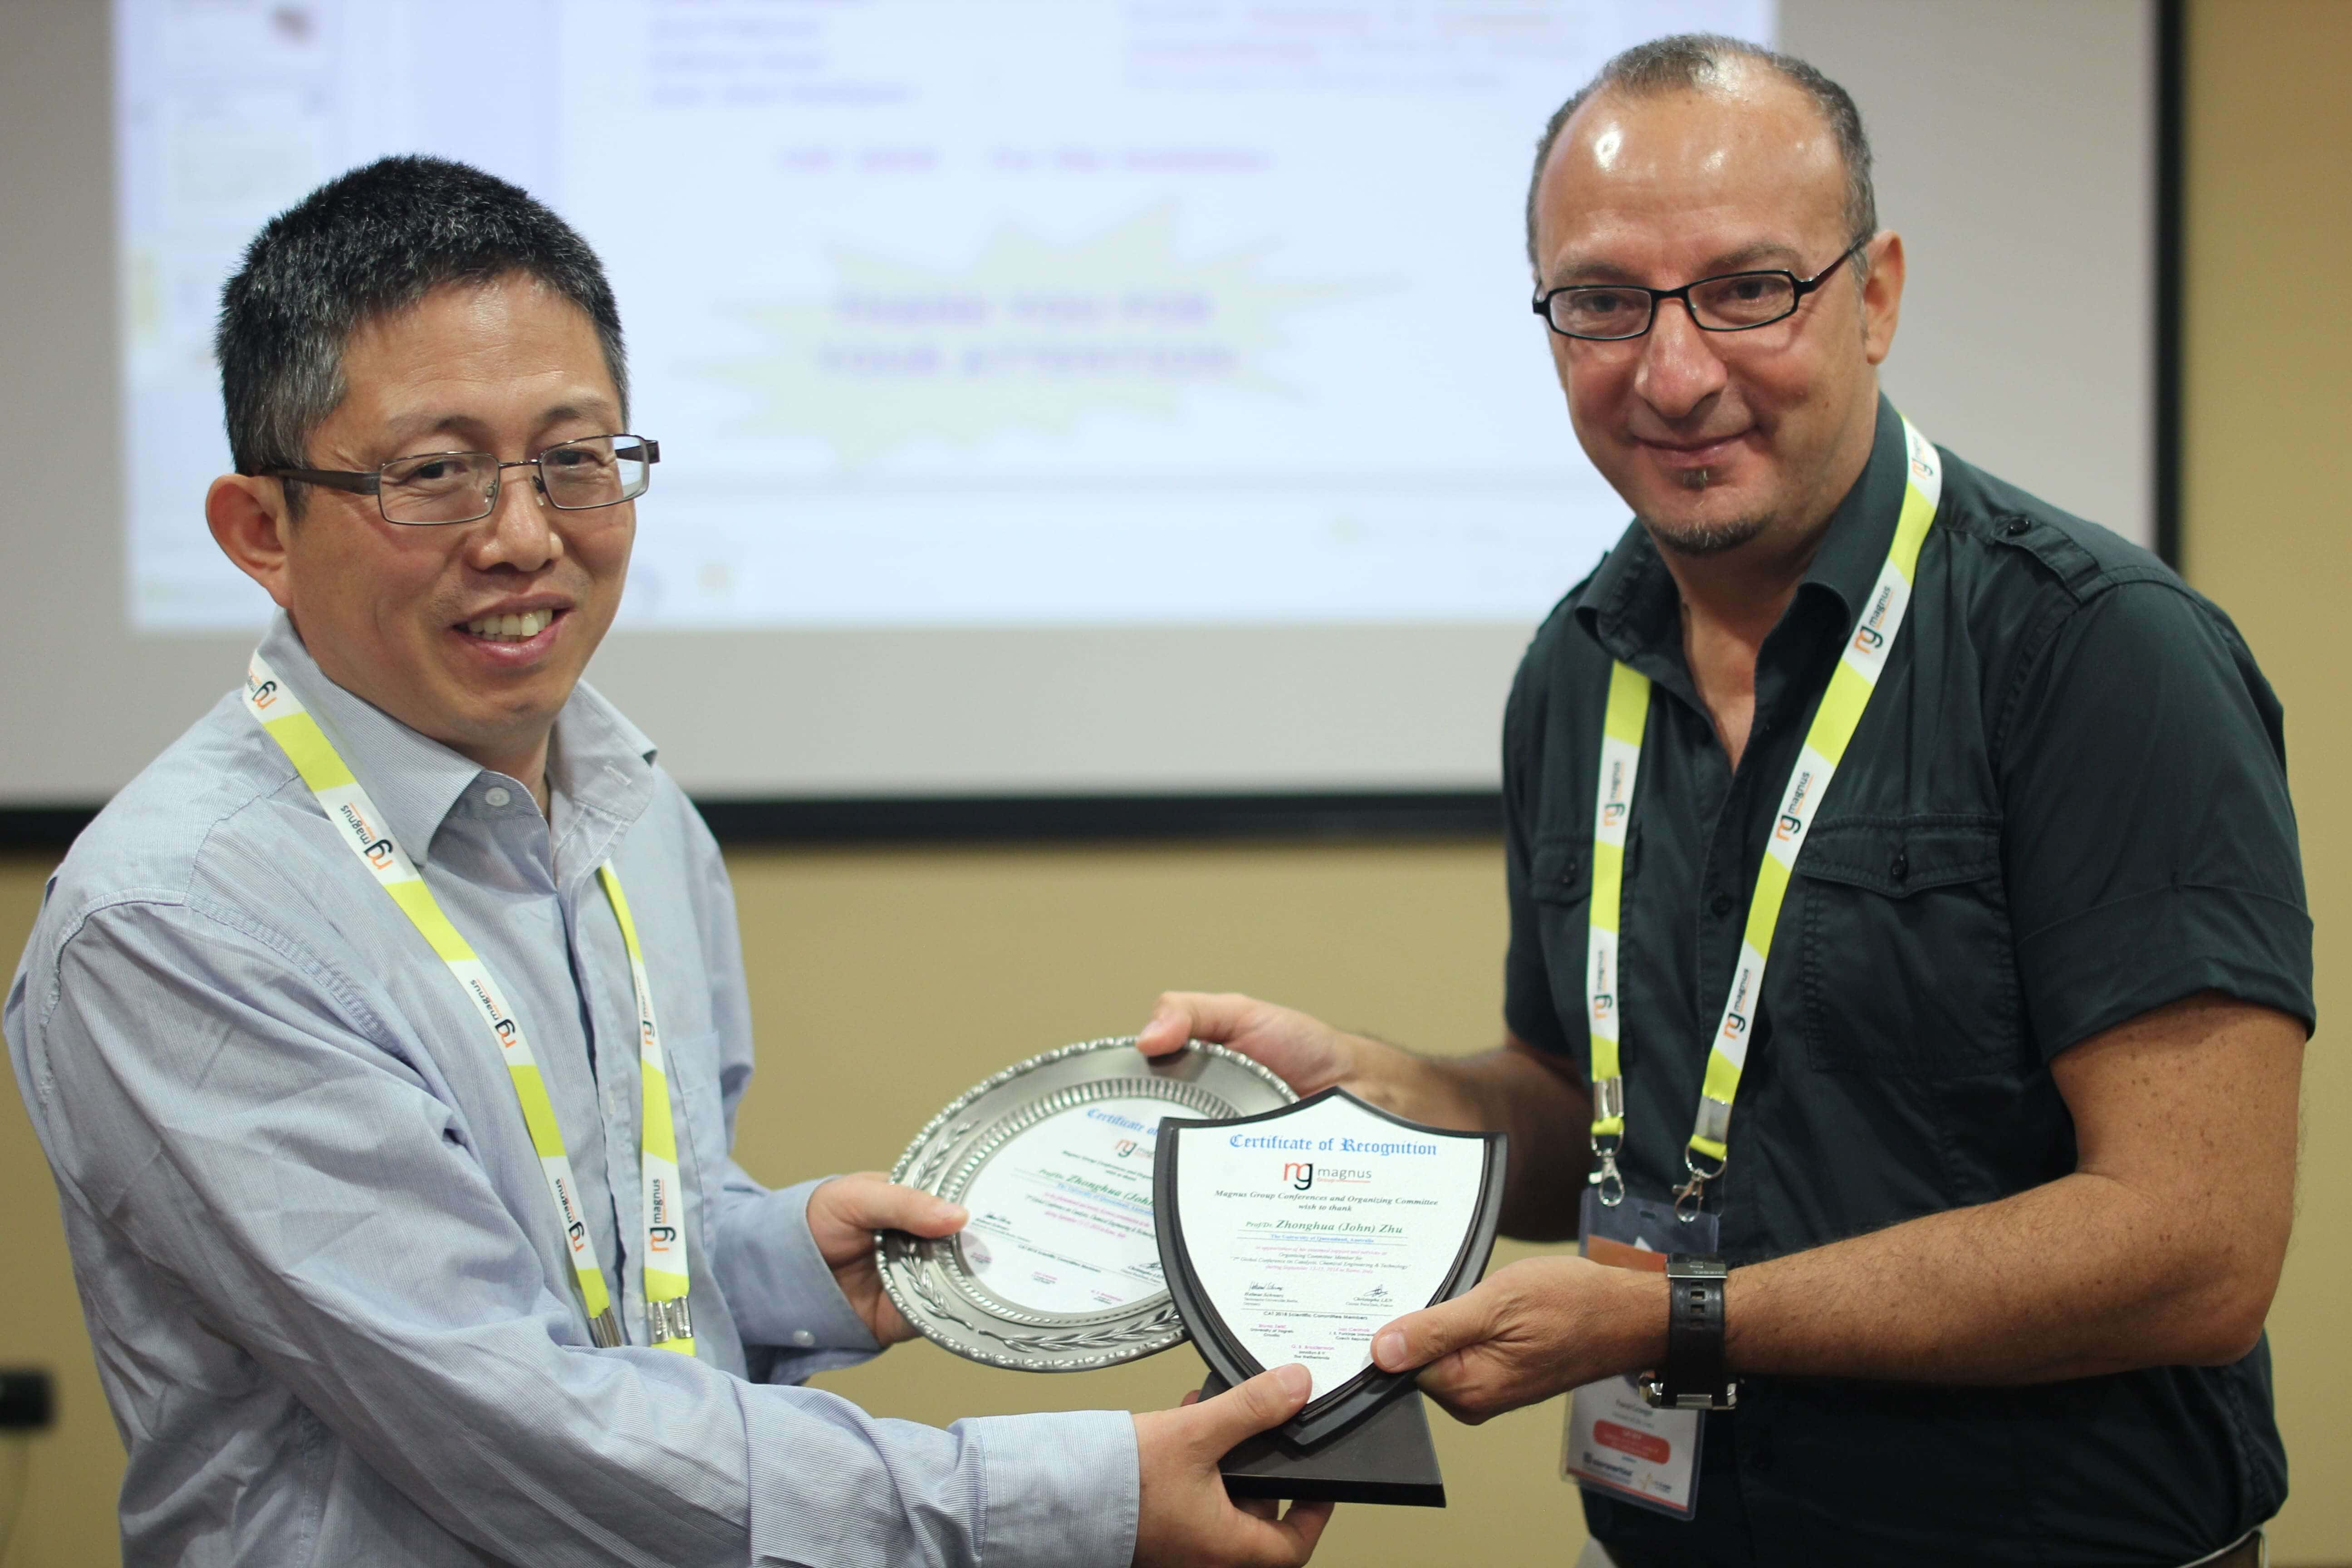 Zhonghua (John) Zhu felicitated by Pascal Granger